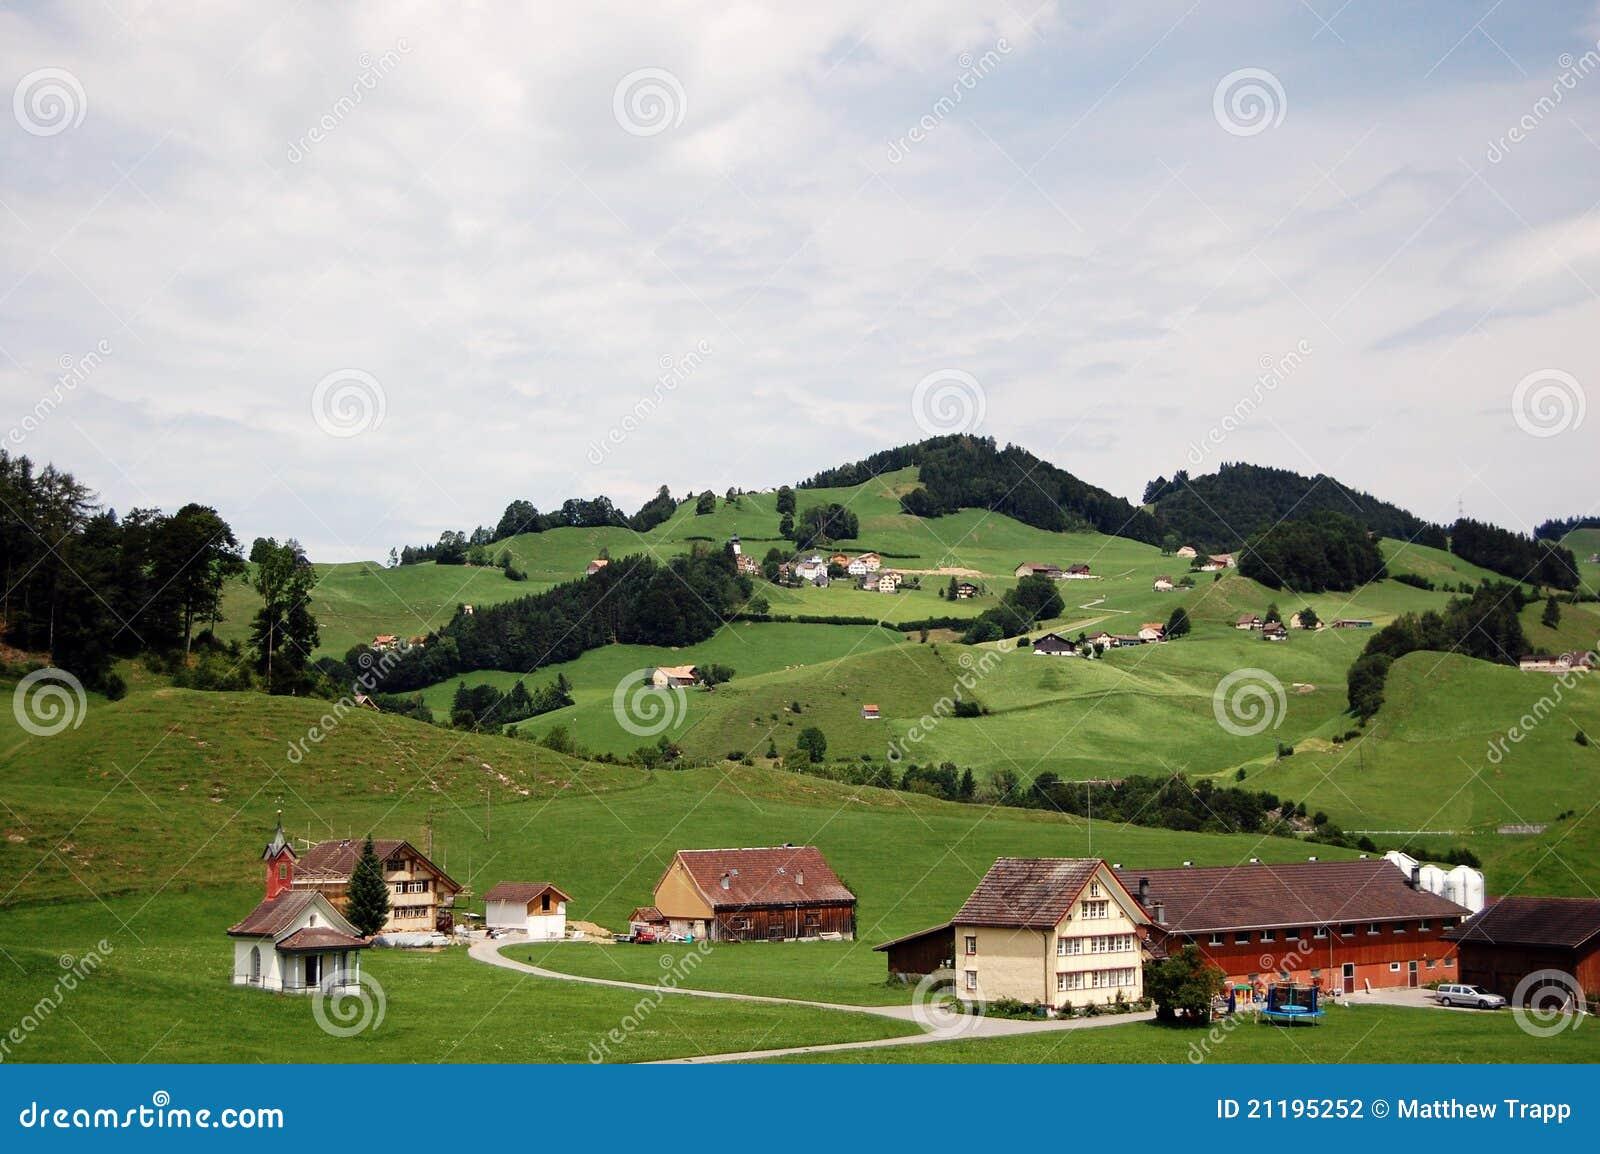 Classic Switzerland countryside